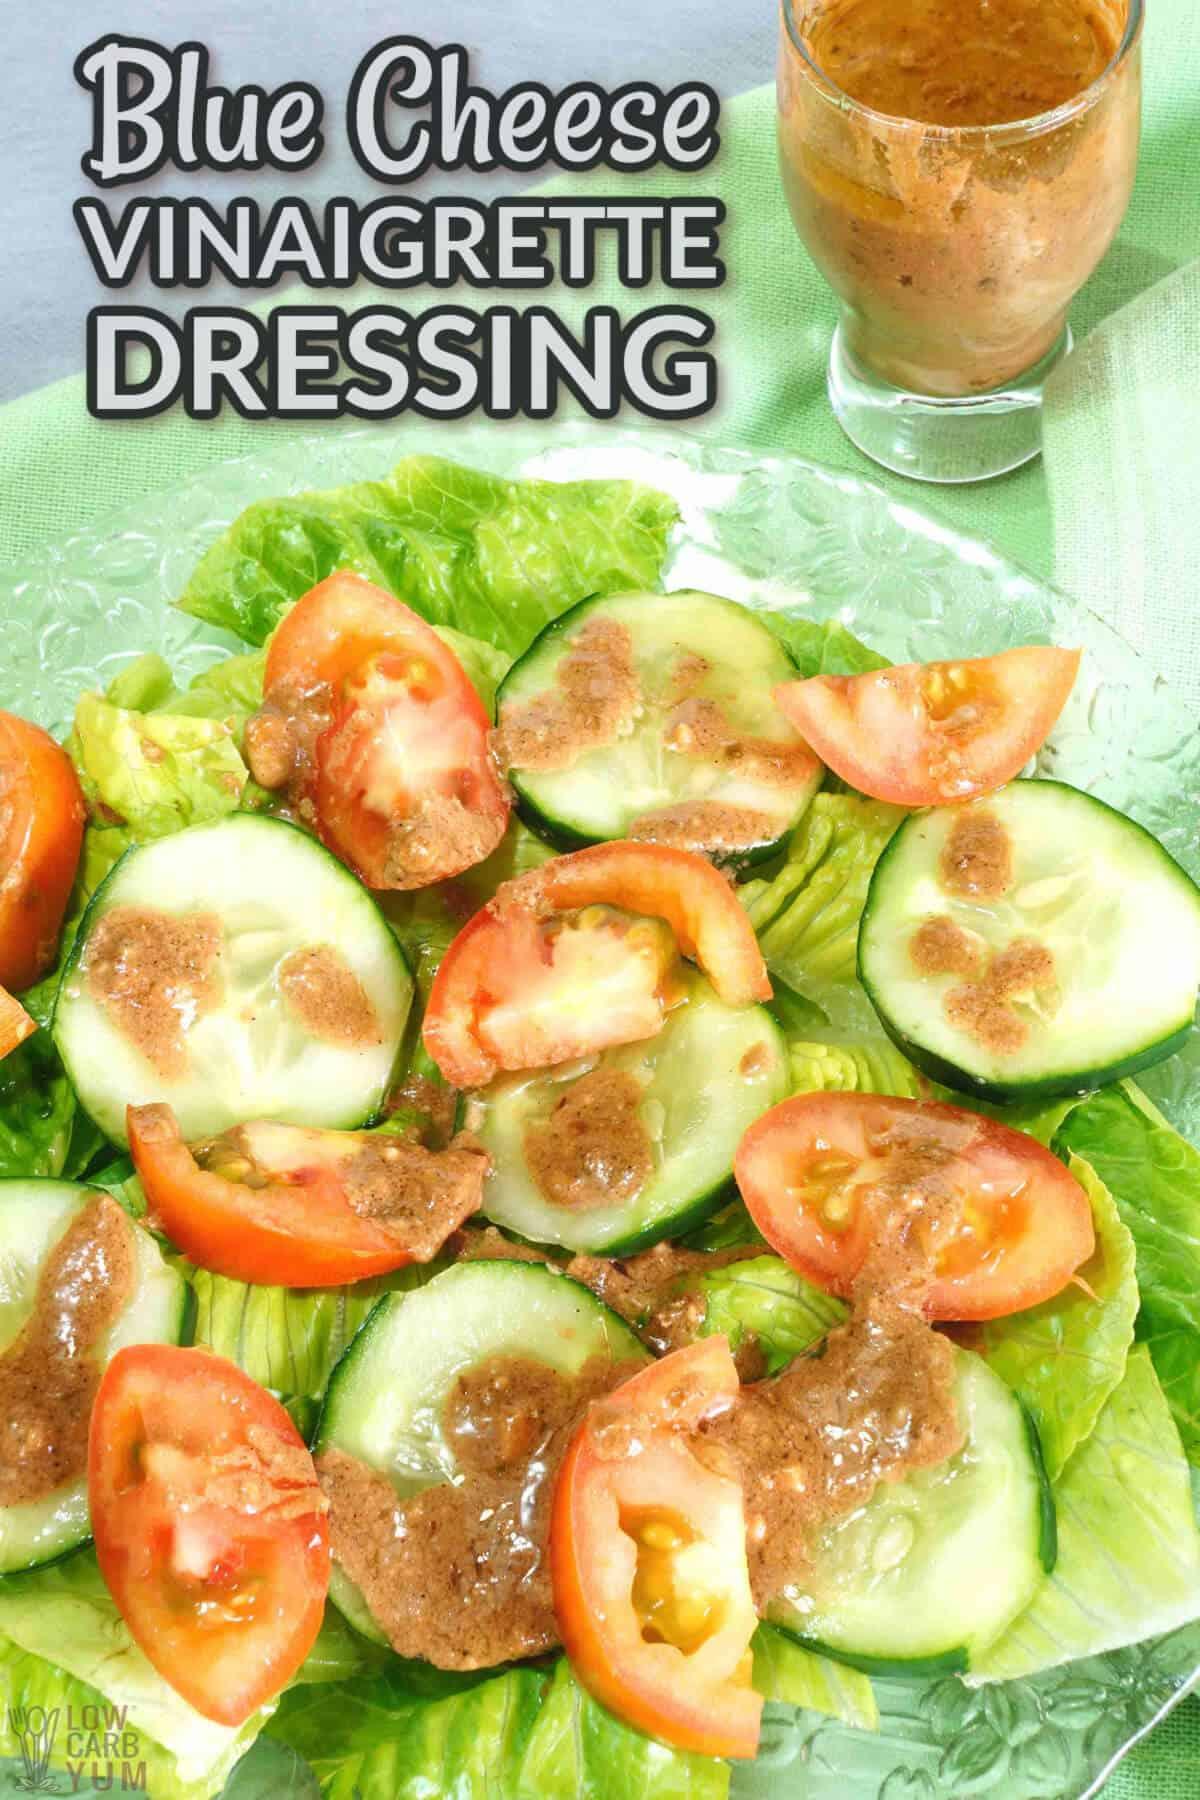 blue cheese vinaigrette dressing recipe cover image